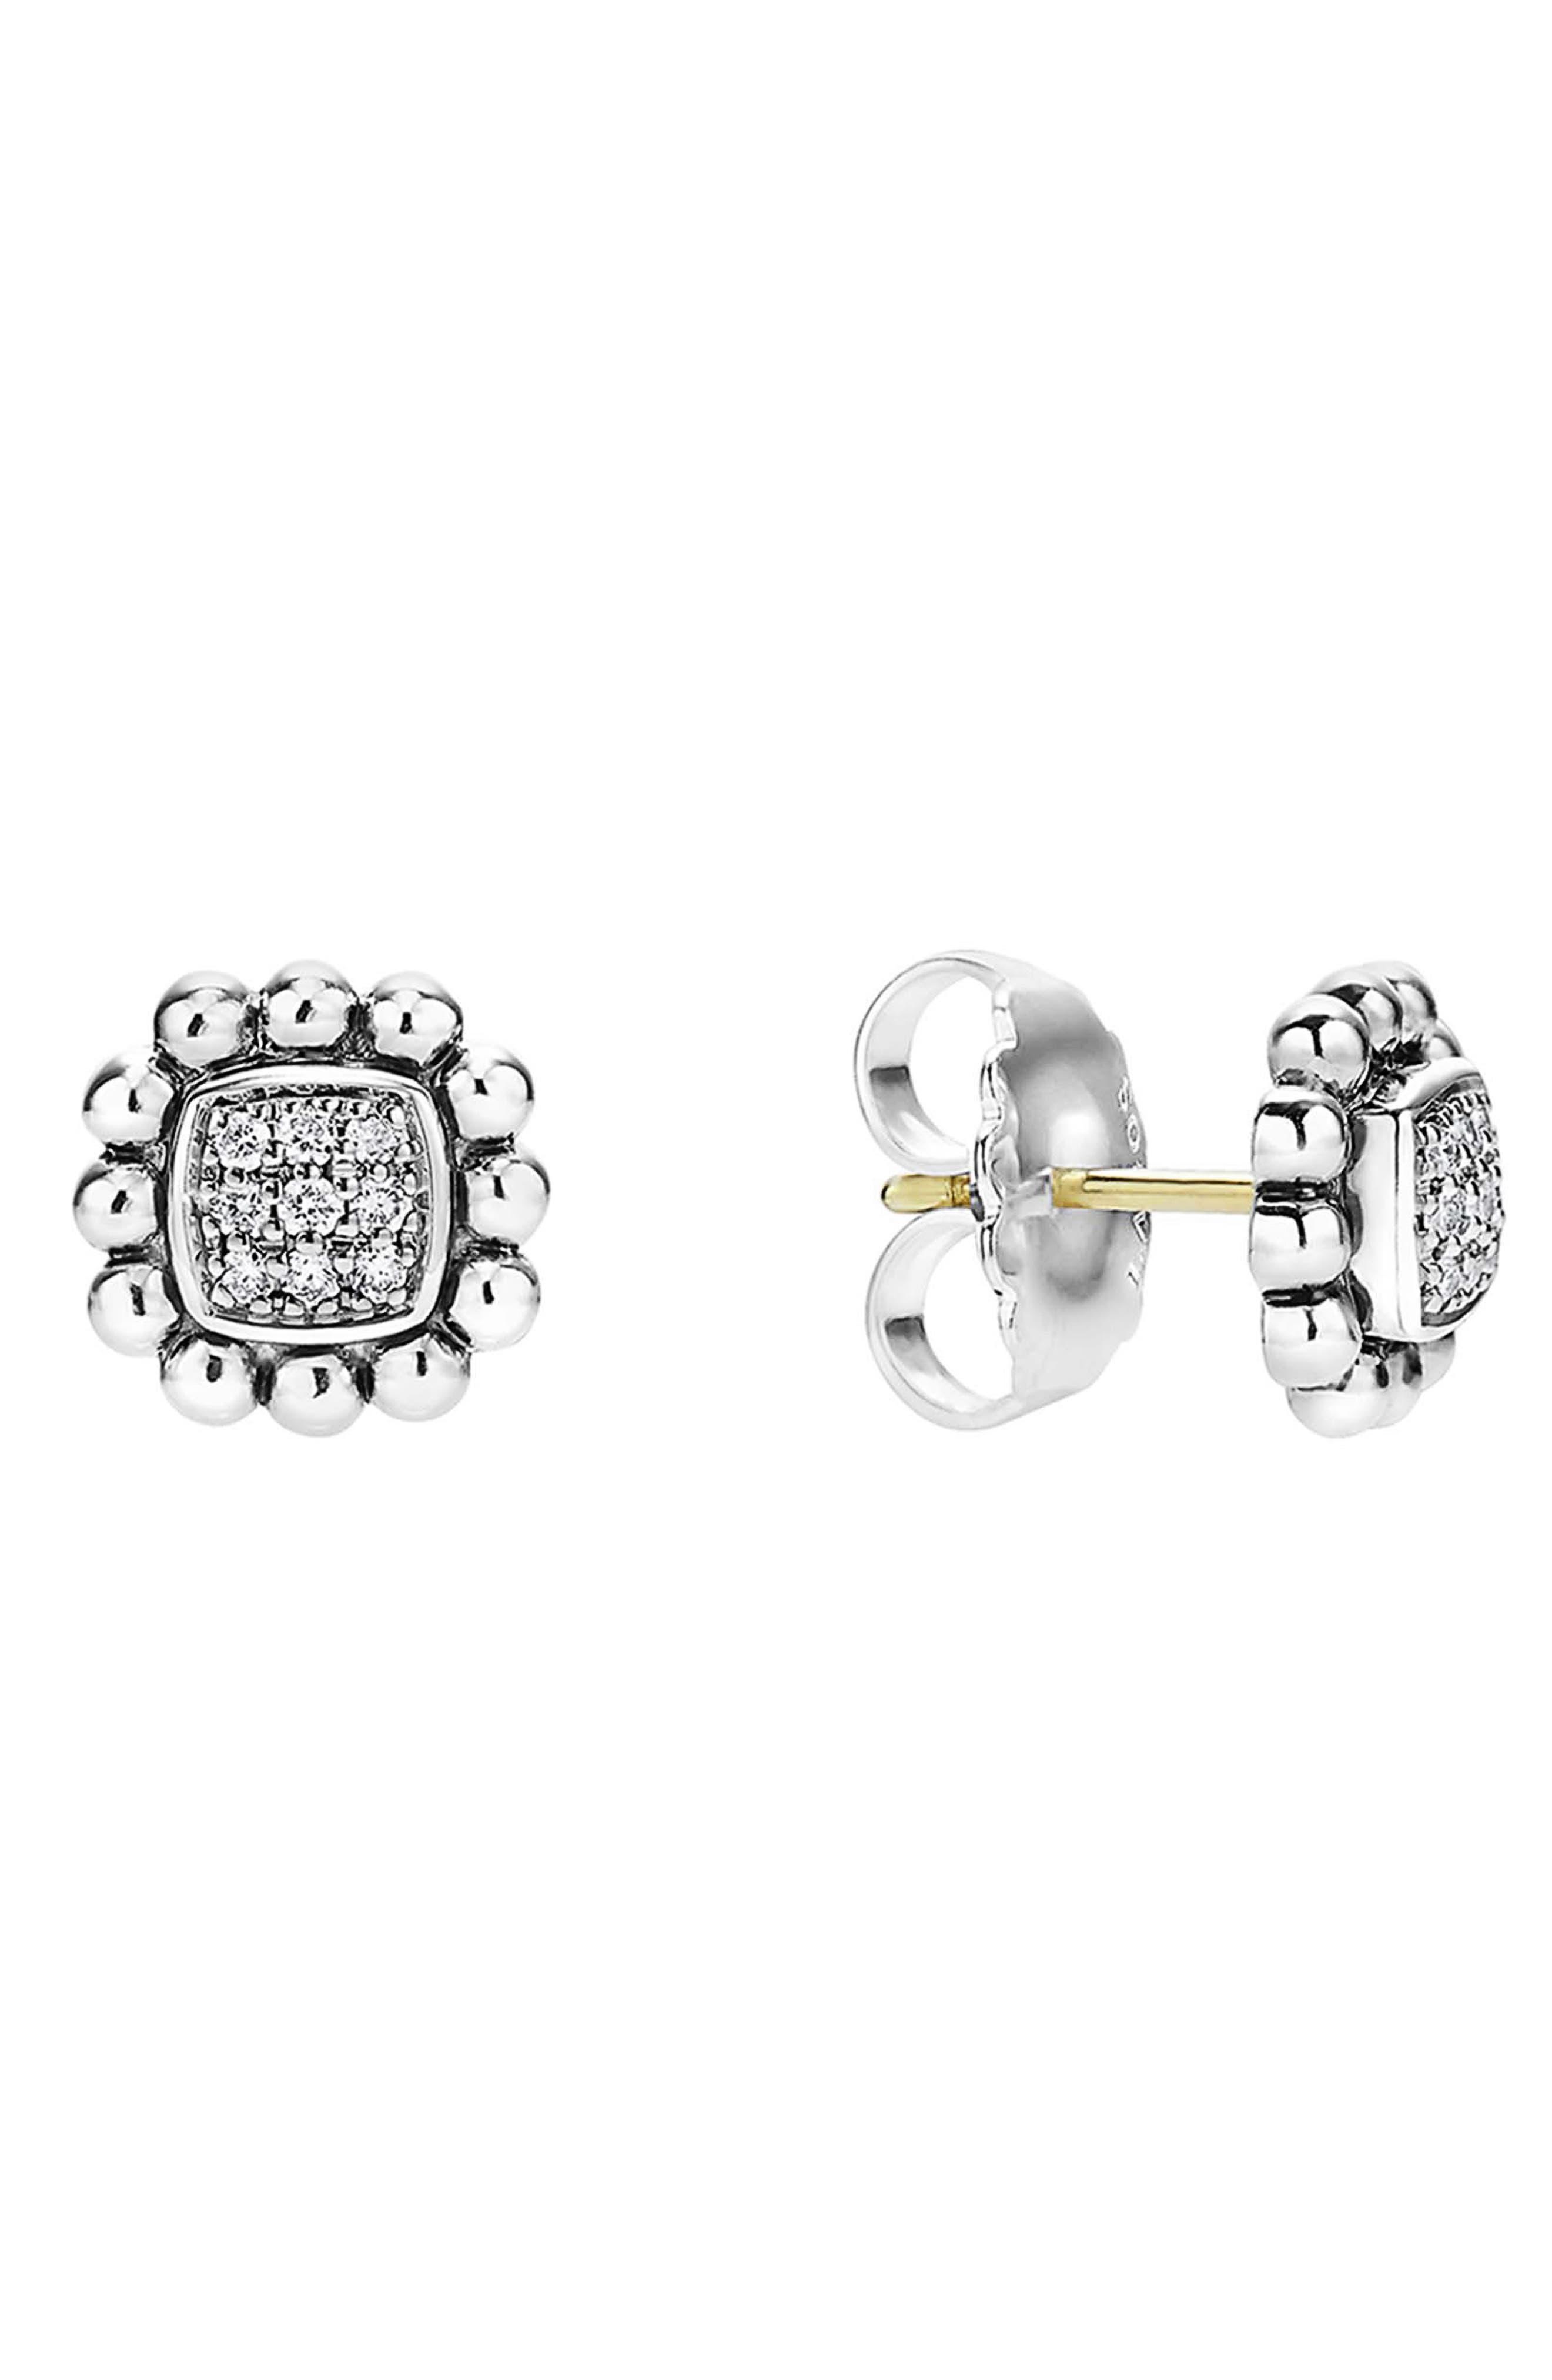 Caviar Spark Diamond Square Stud Earrings,                             Main thumbnail 1, color,                             SILVER/ DIAMOND